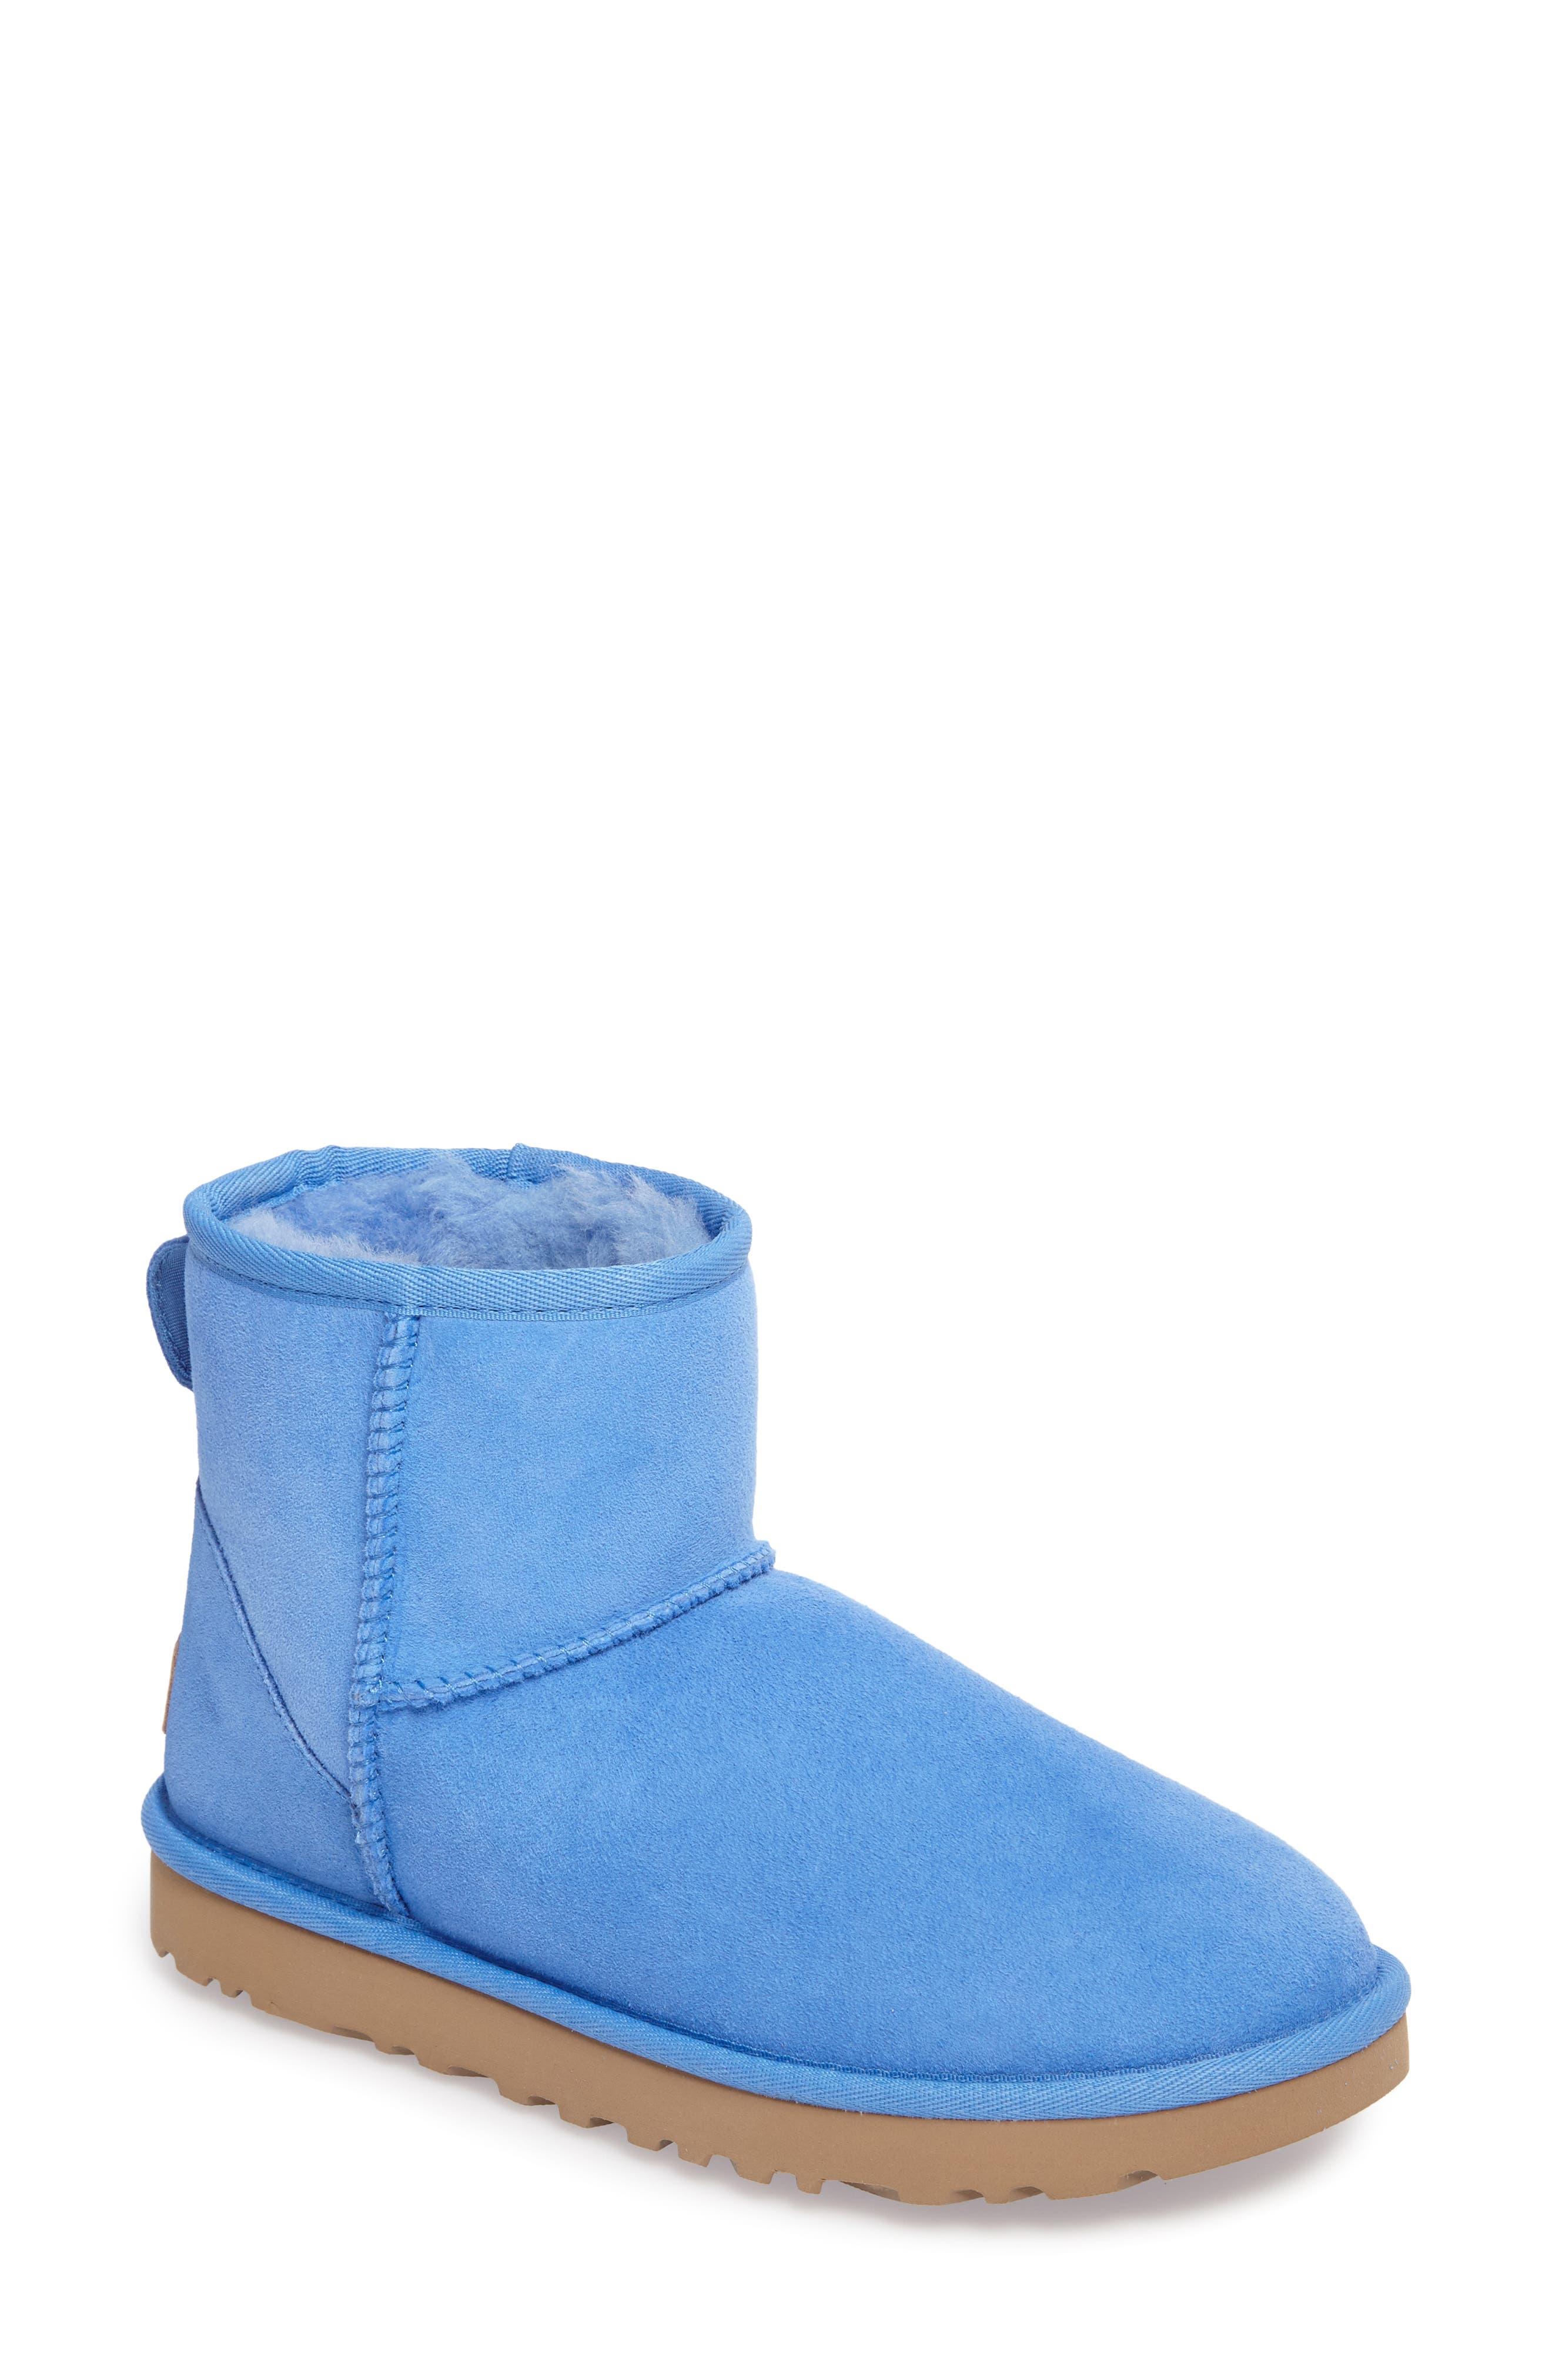 Main Image - UGG® 'Classic Mini II' Genuine Shearling Lined Boot (Women)